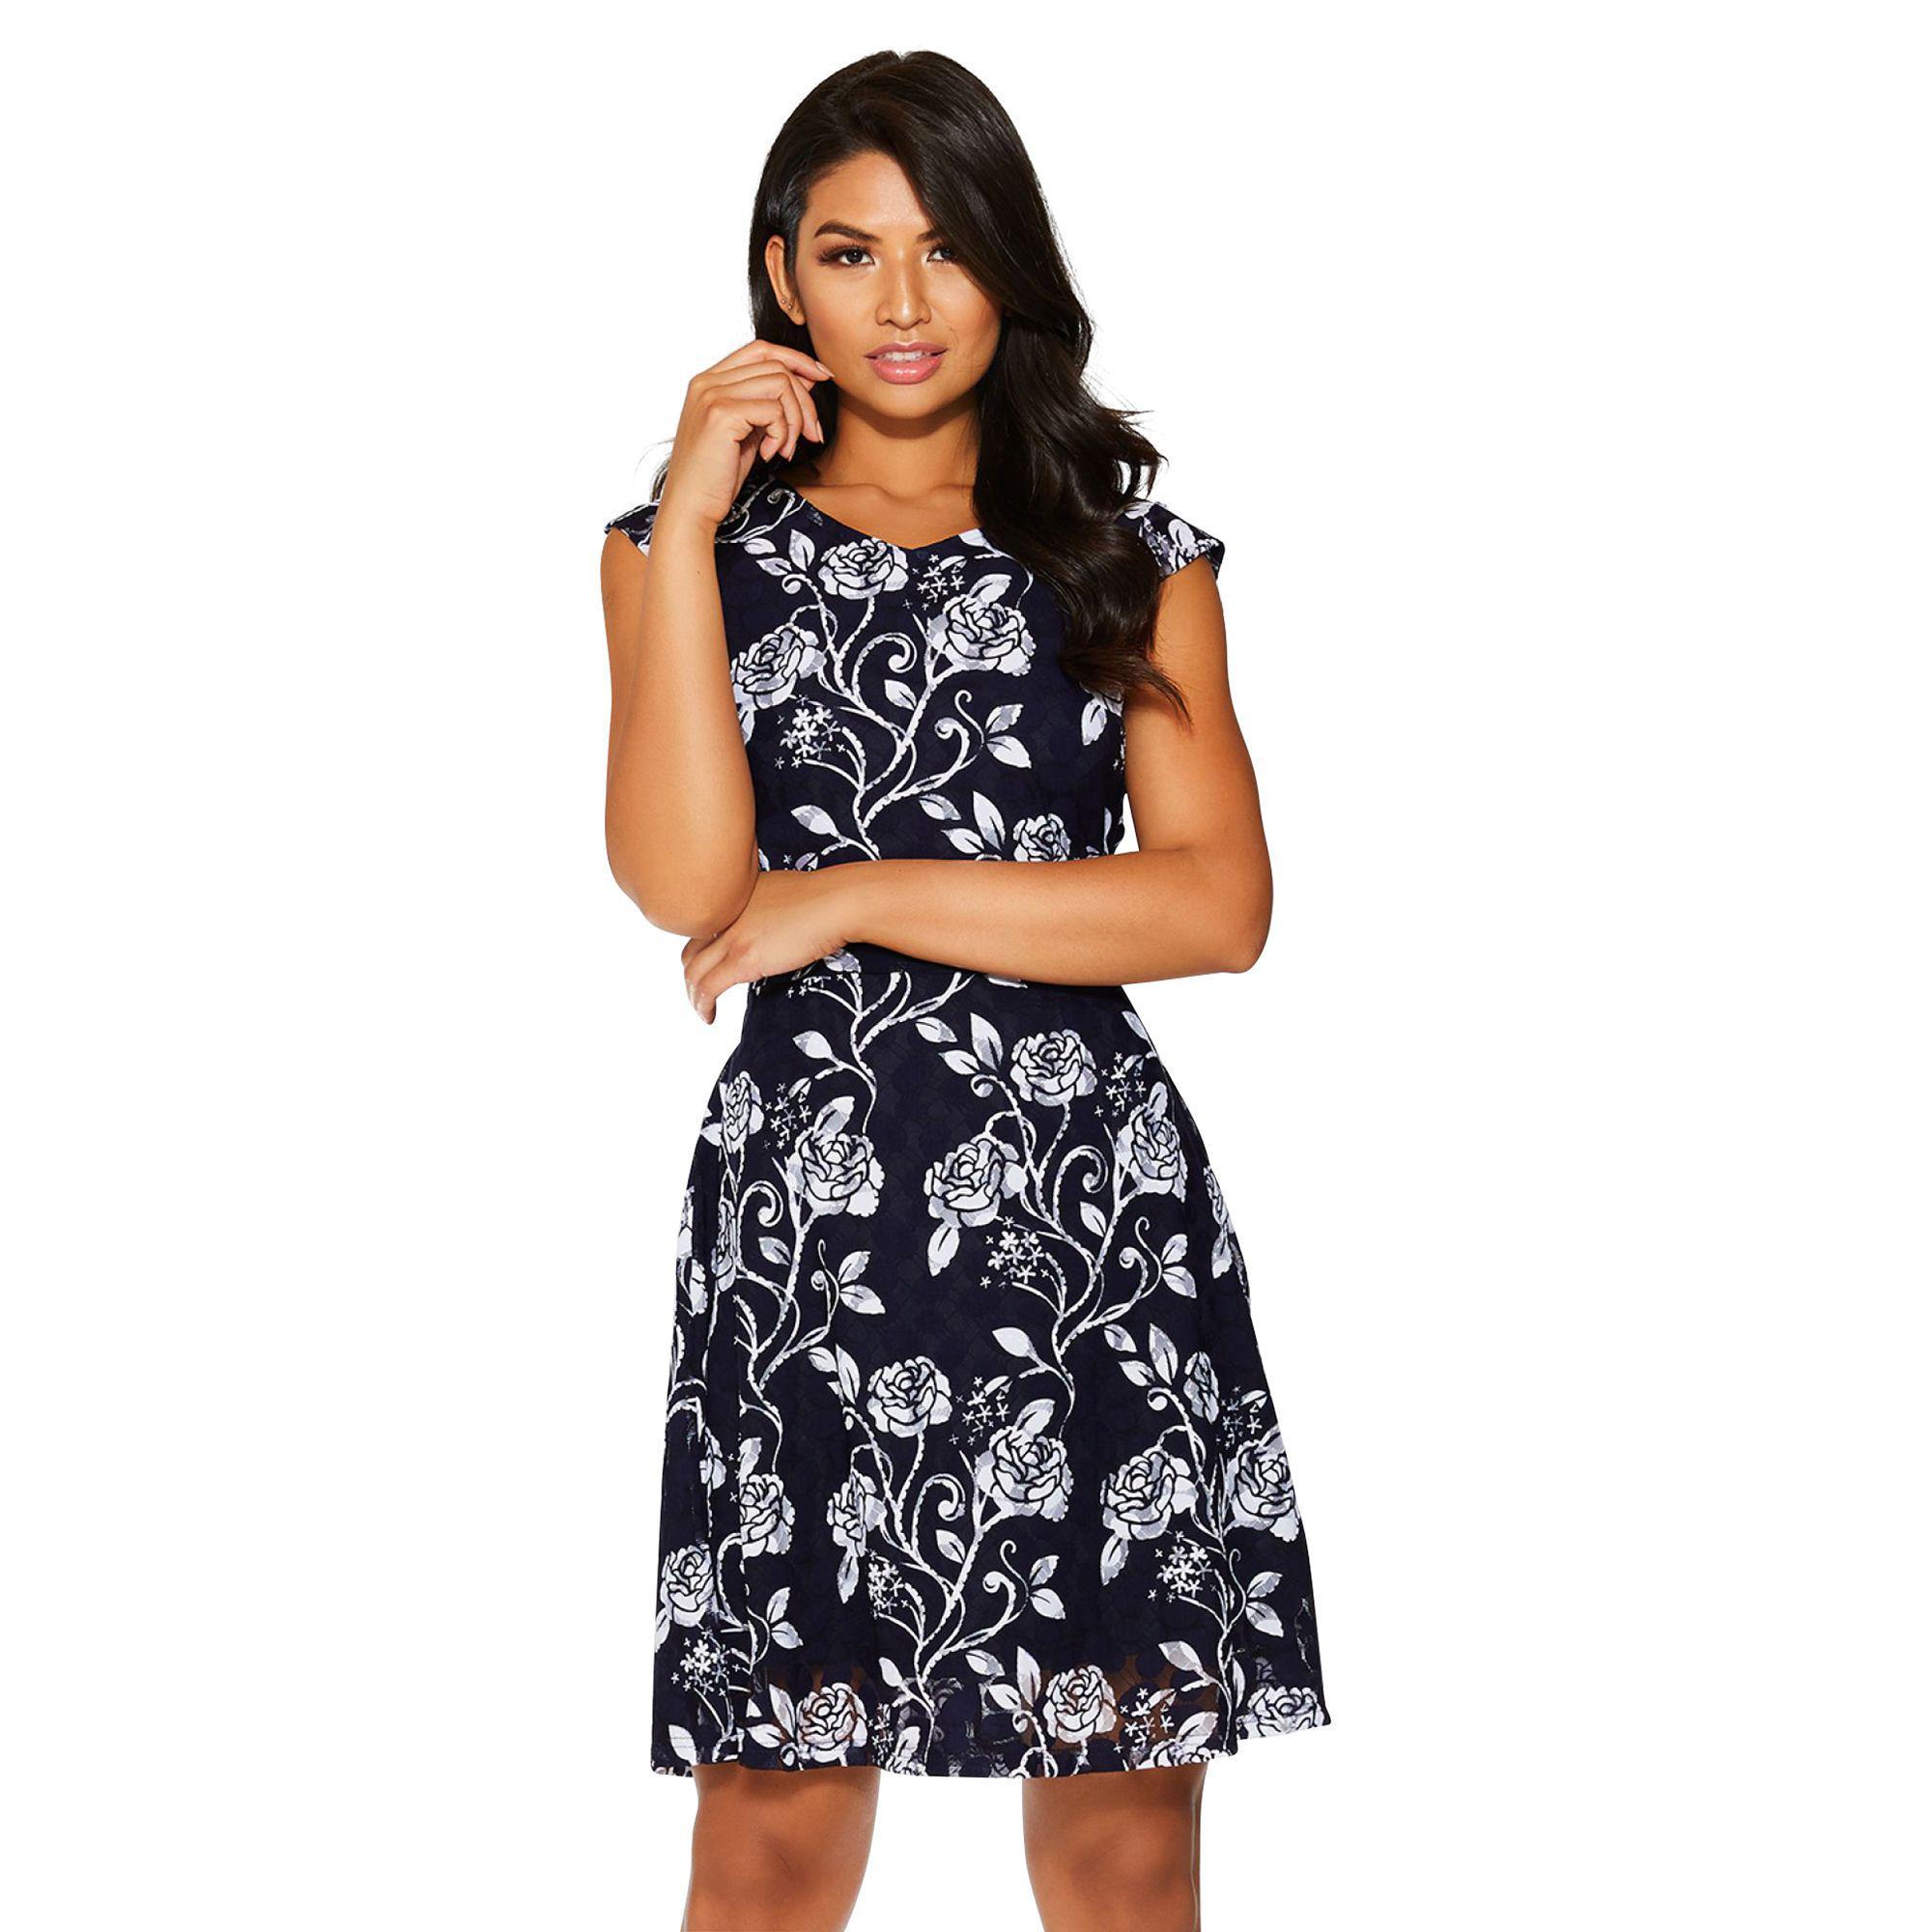 328419b2f1 Quiz Navy Lace Flower Print Skater Dress in Blue - Lyst